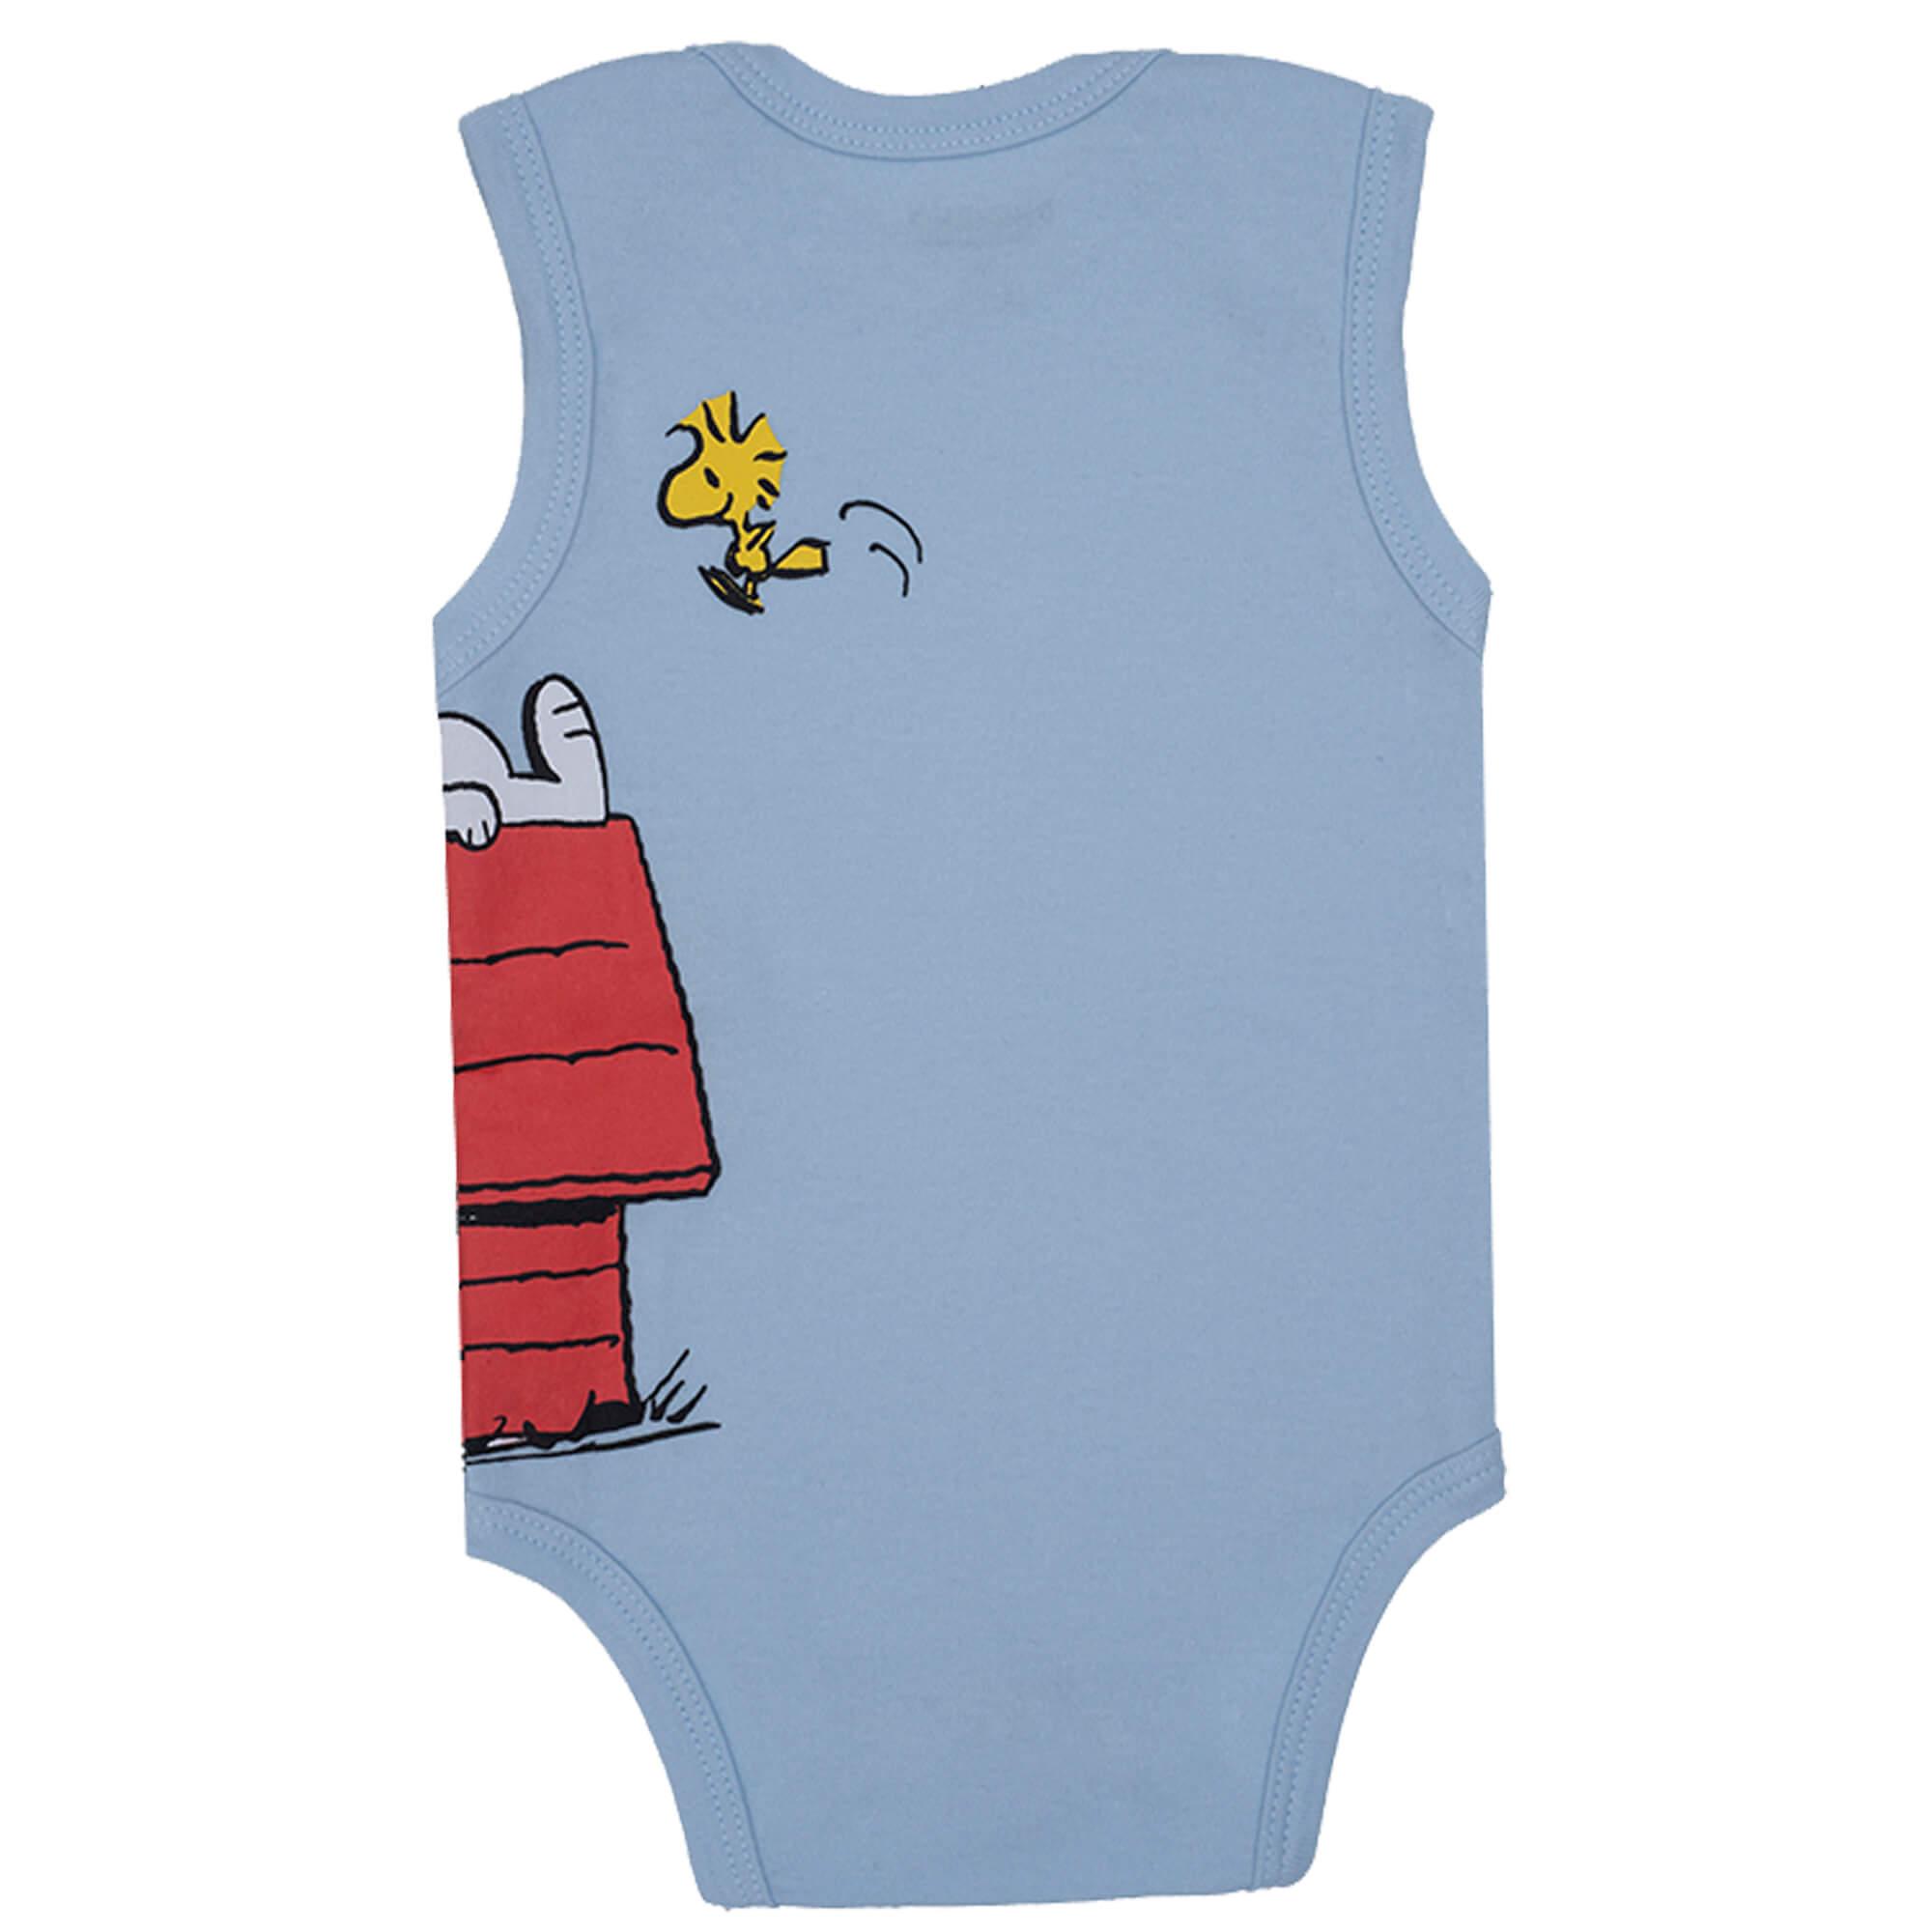 Body Regata Pimpolho Snoopy Na Casinha – Azul claro – RN ao G